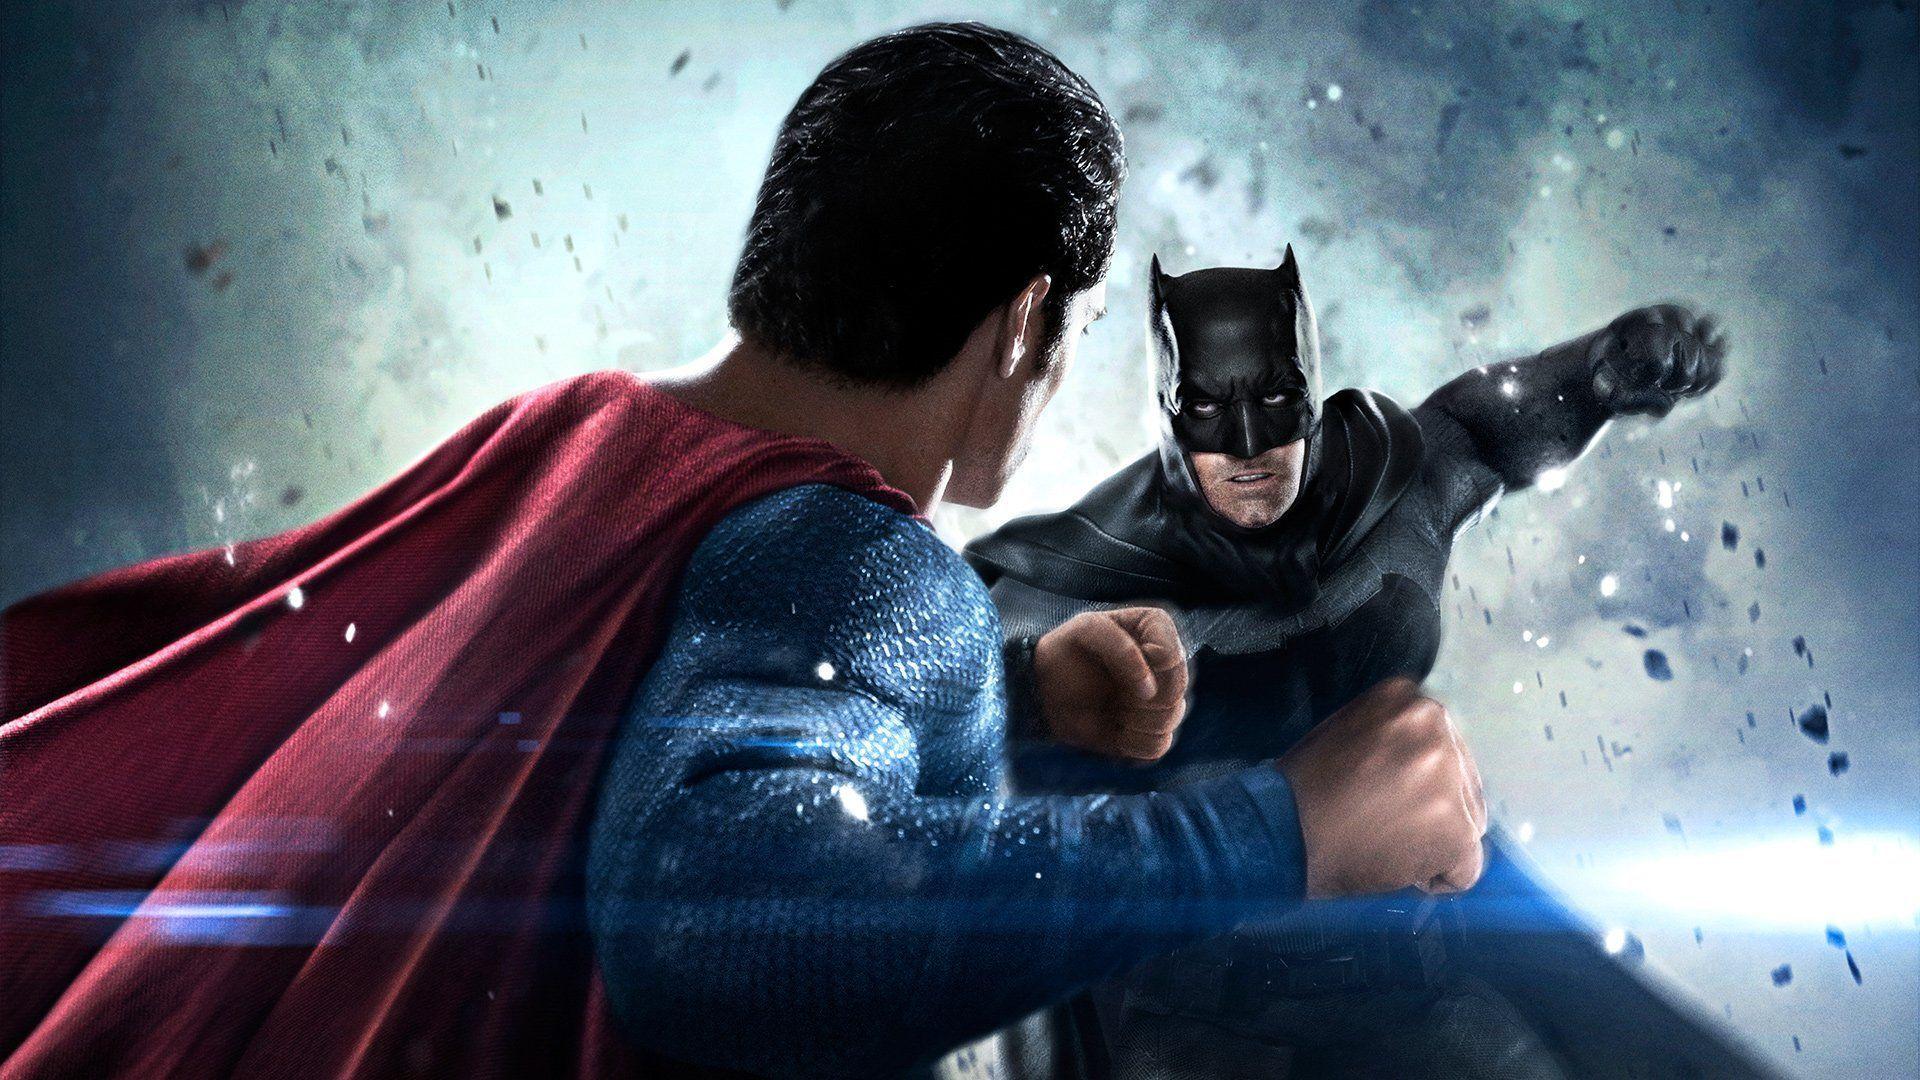 Top 20 Superhero Movies To Watch on Amazon Prime Video